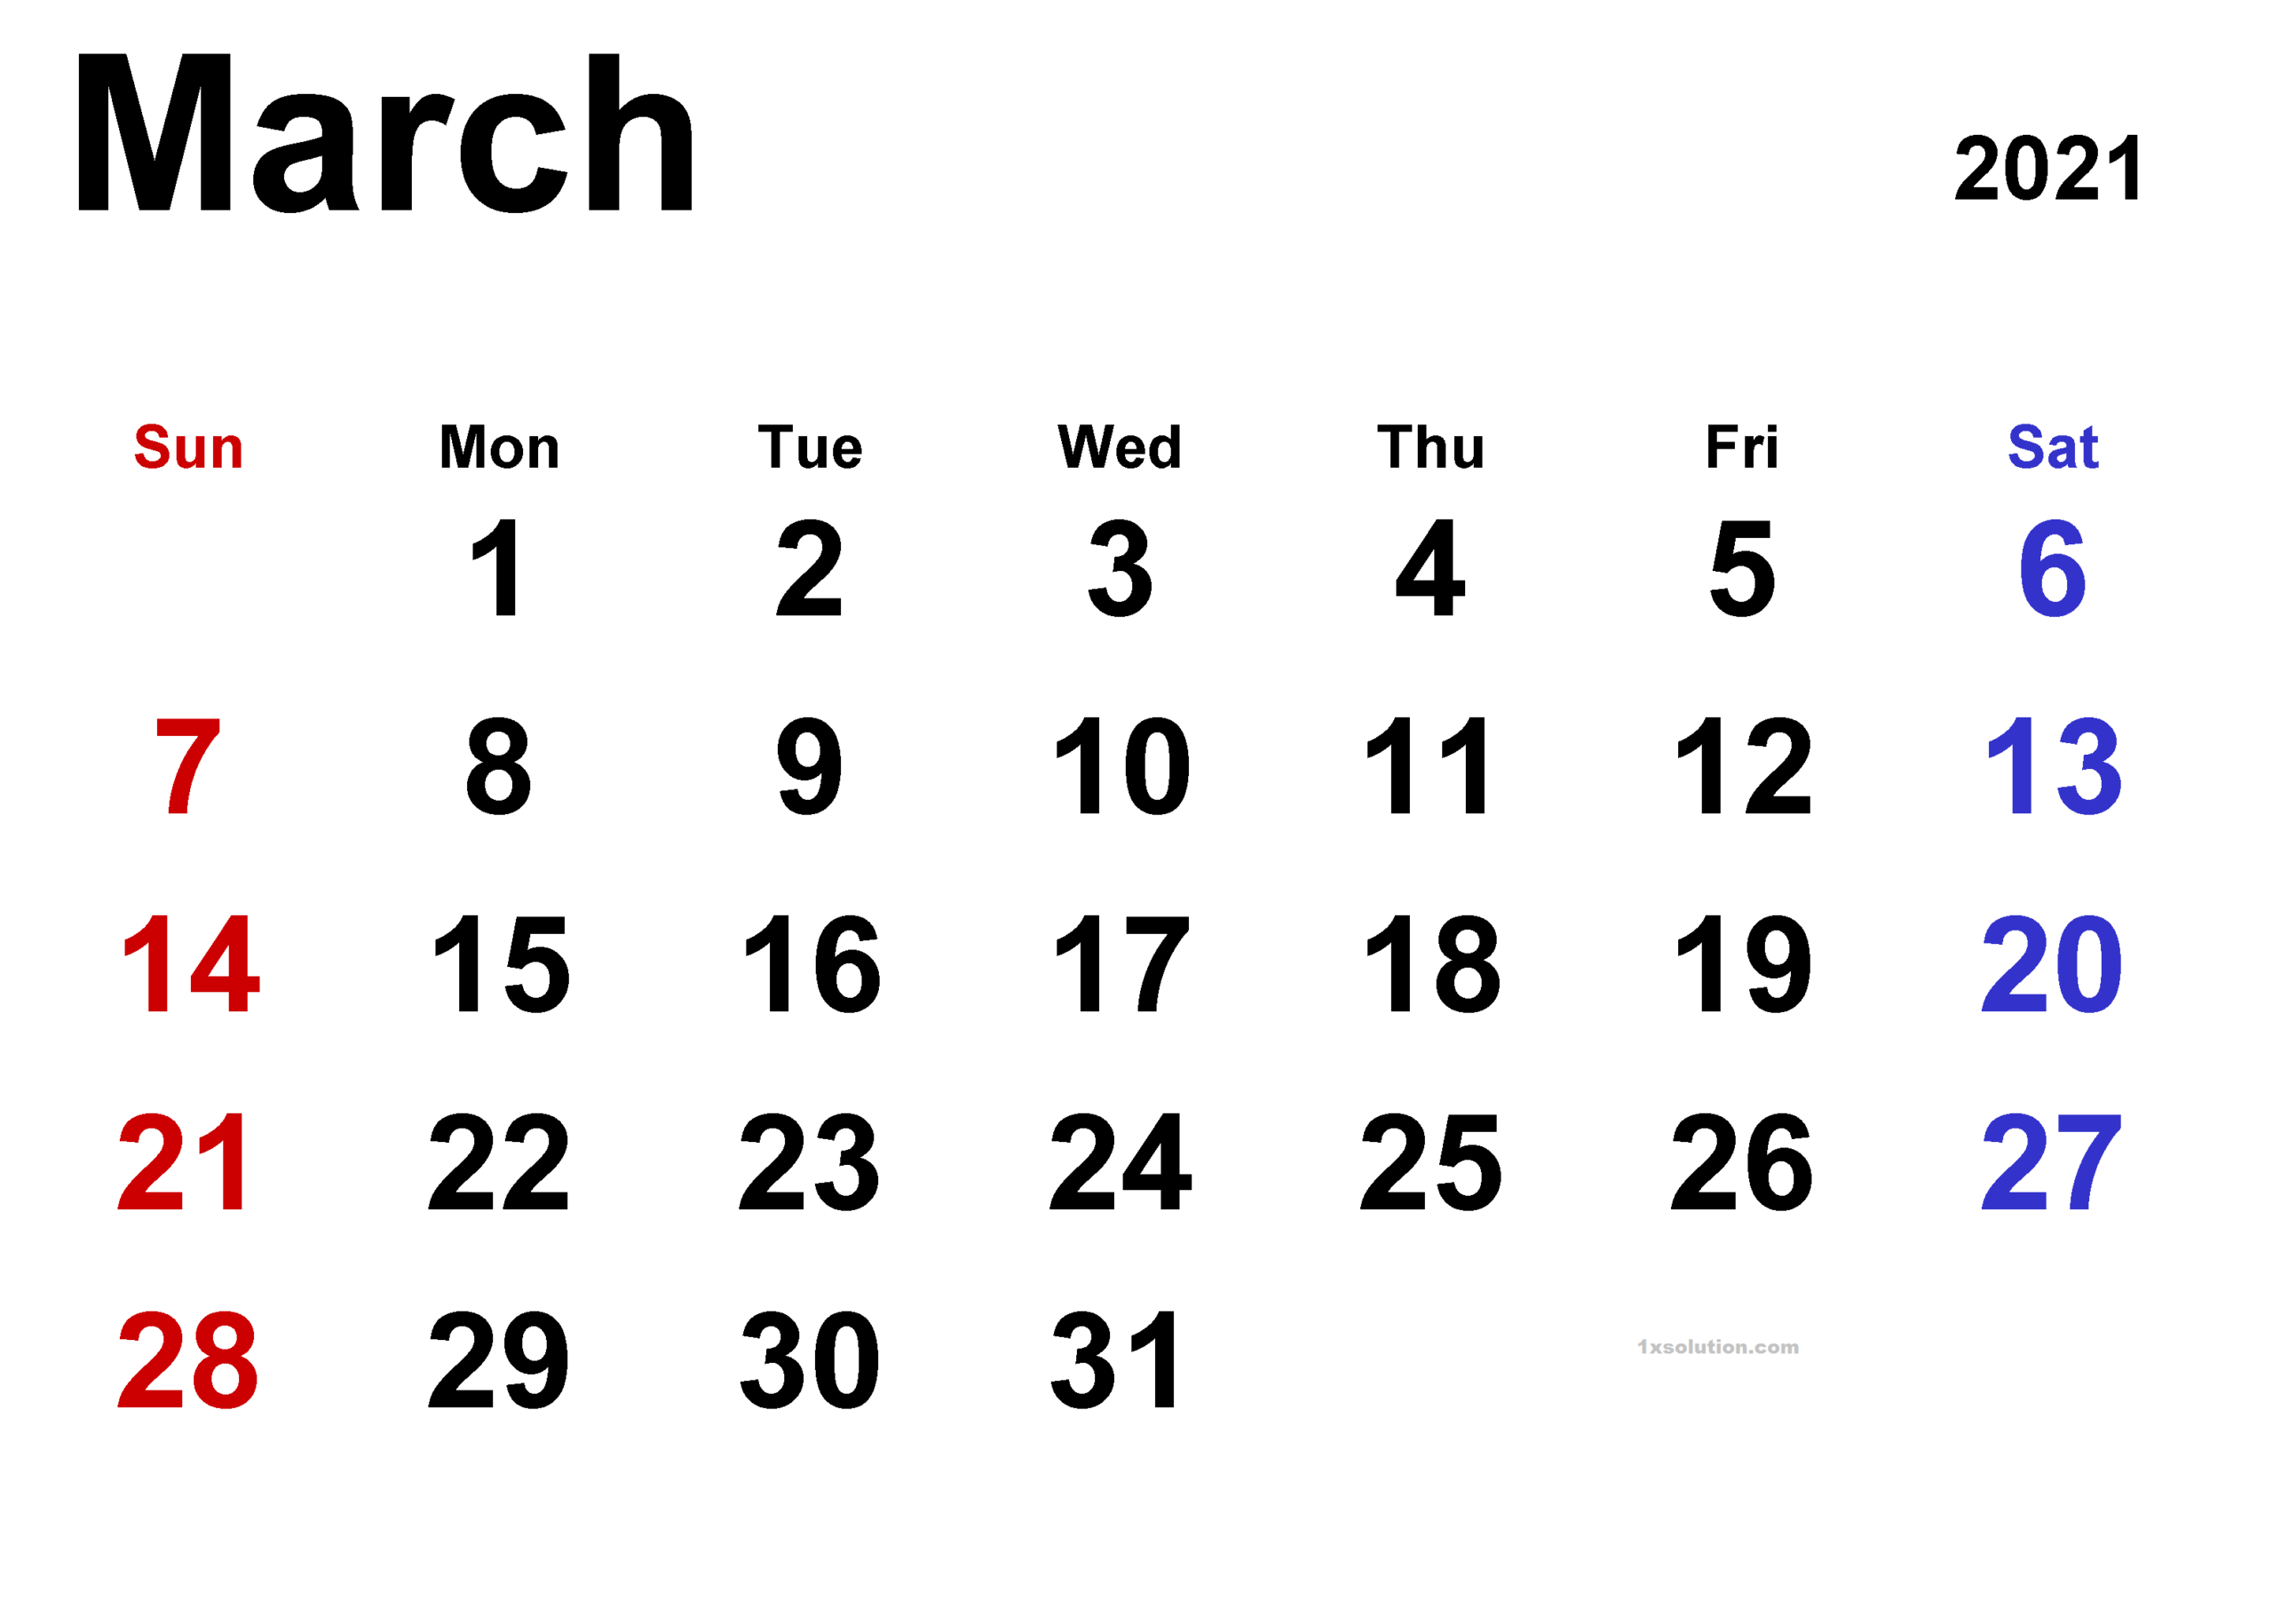 March 2021 Calendar Printable - Wallpaper Image   Calendar-2021 Calendar Printable Free Pdf March